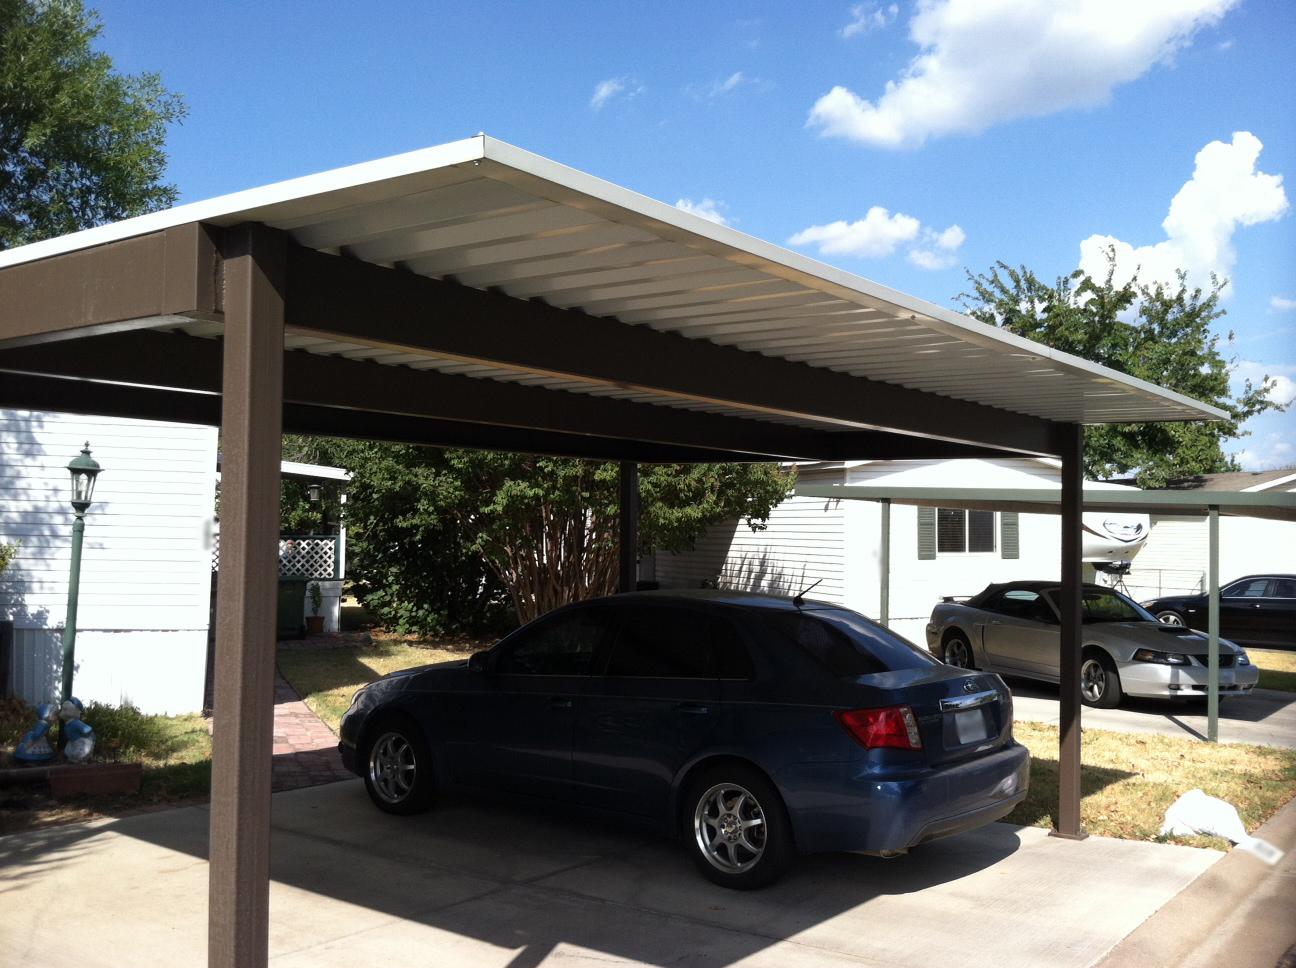 Rv Carports Texas : Complete carports of texas